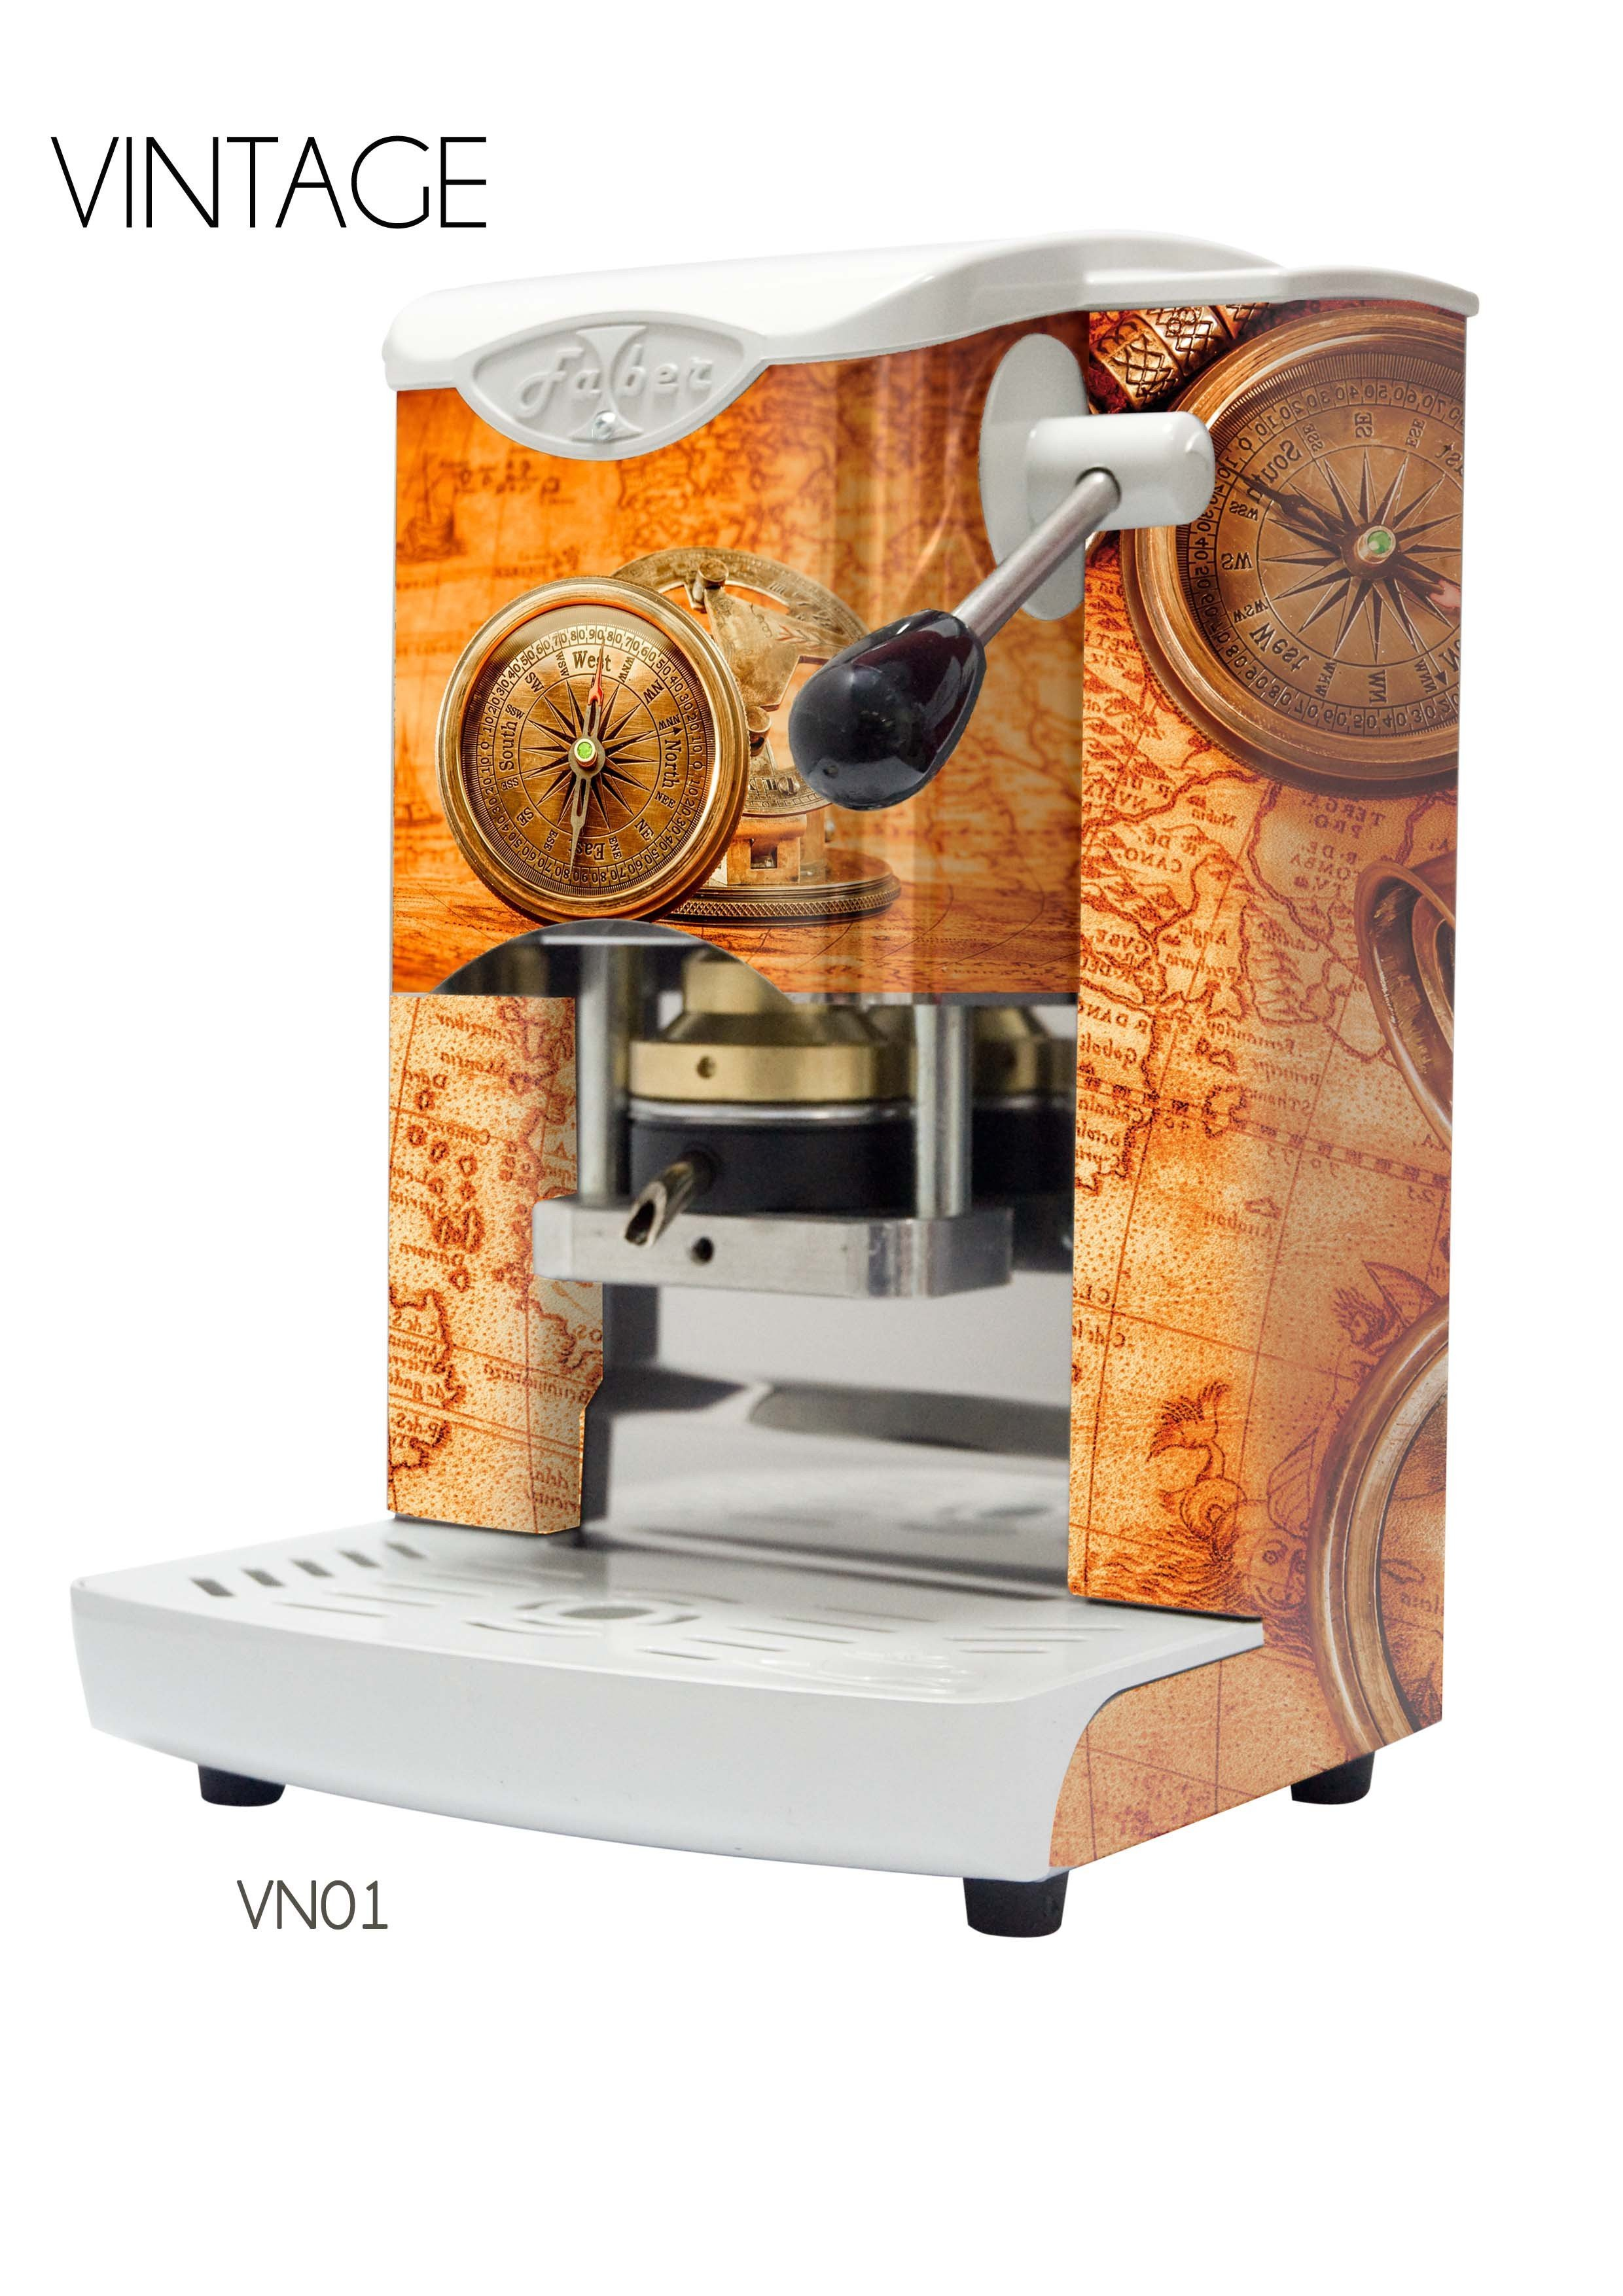 macchina del caffè vintage a Sciacca